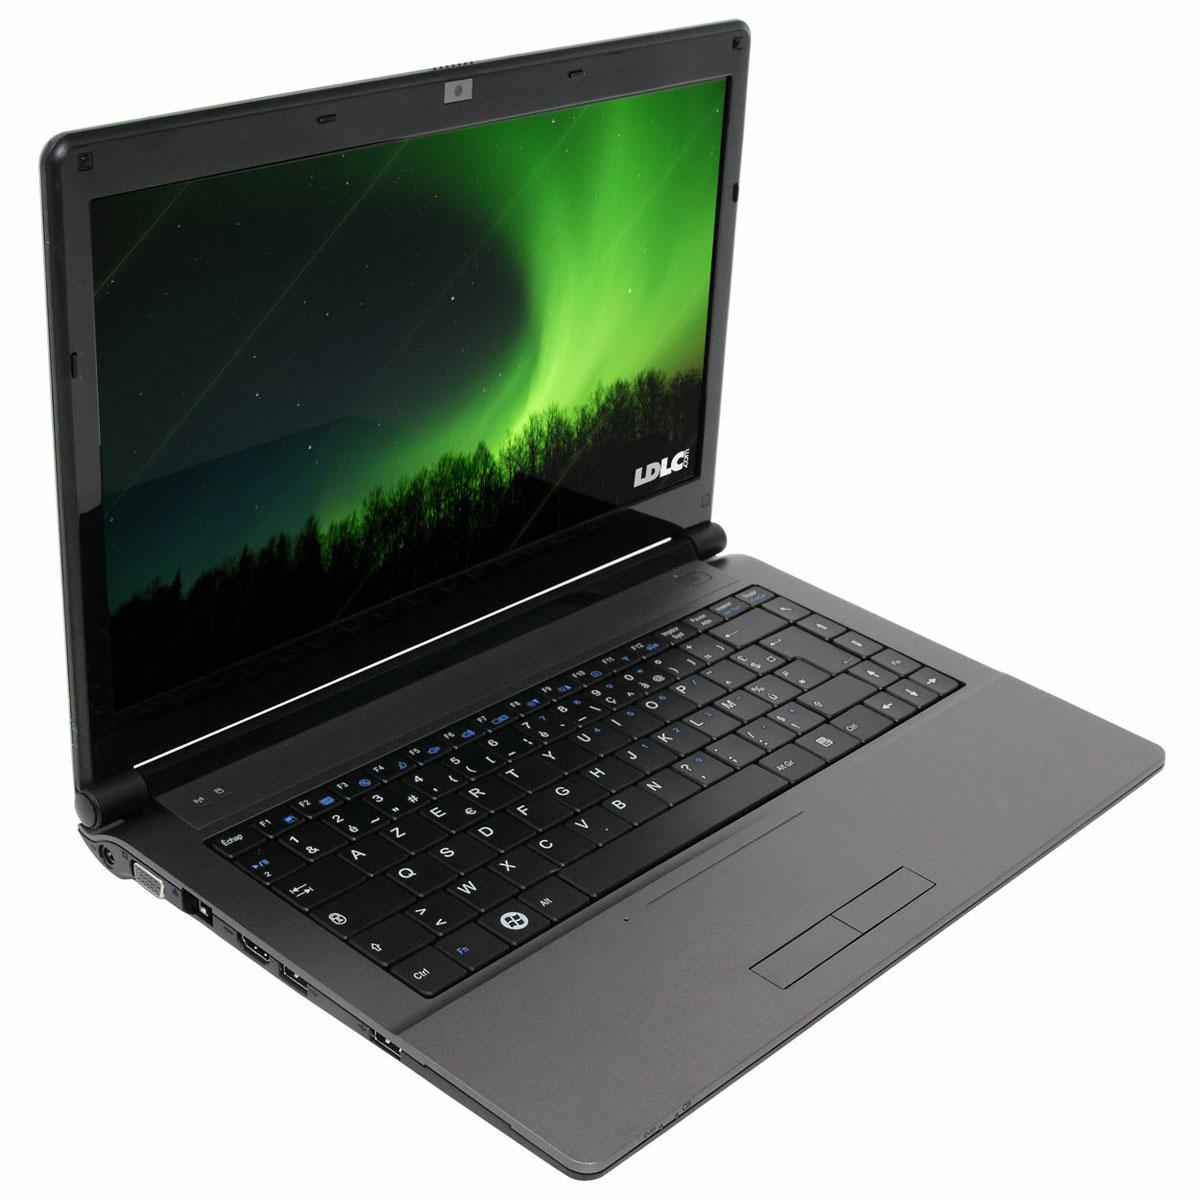 "PC portable LDLC Aurore BS2-I5-8-S2-P Intel Core i5-2450M 8 Go SSD 240 Go 14"" LED Graveur DVD Wi-Fi N/Bluetooth Webcam Windows 7 Professionnel 64 bits"